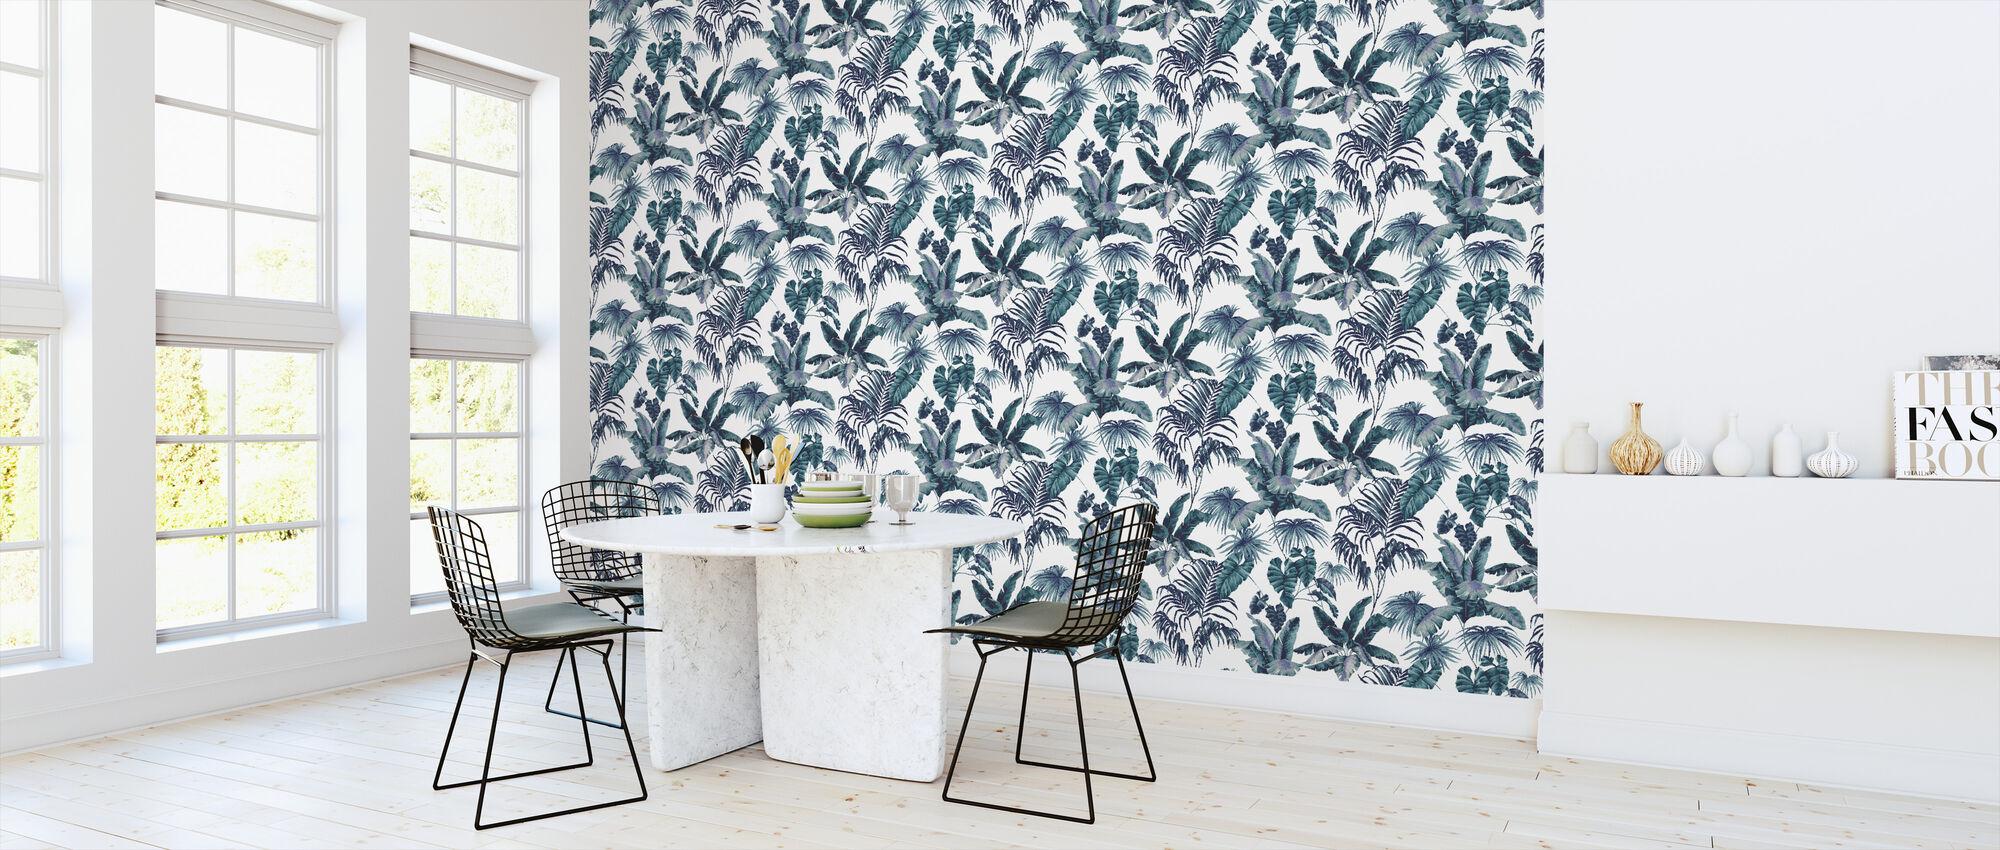 Tropic Toile Marine - Wallpaper - Kitchen